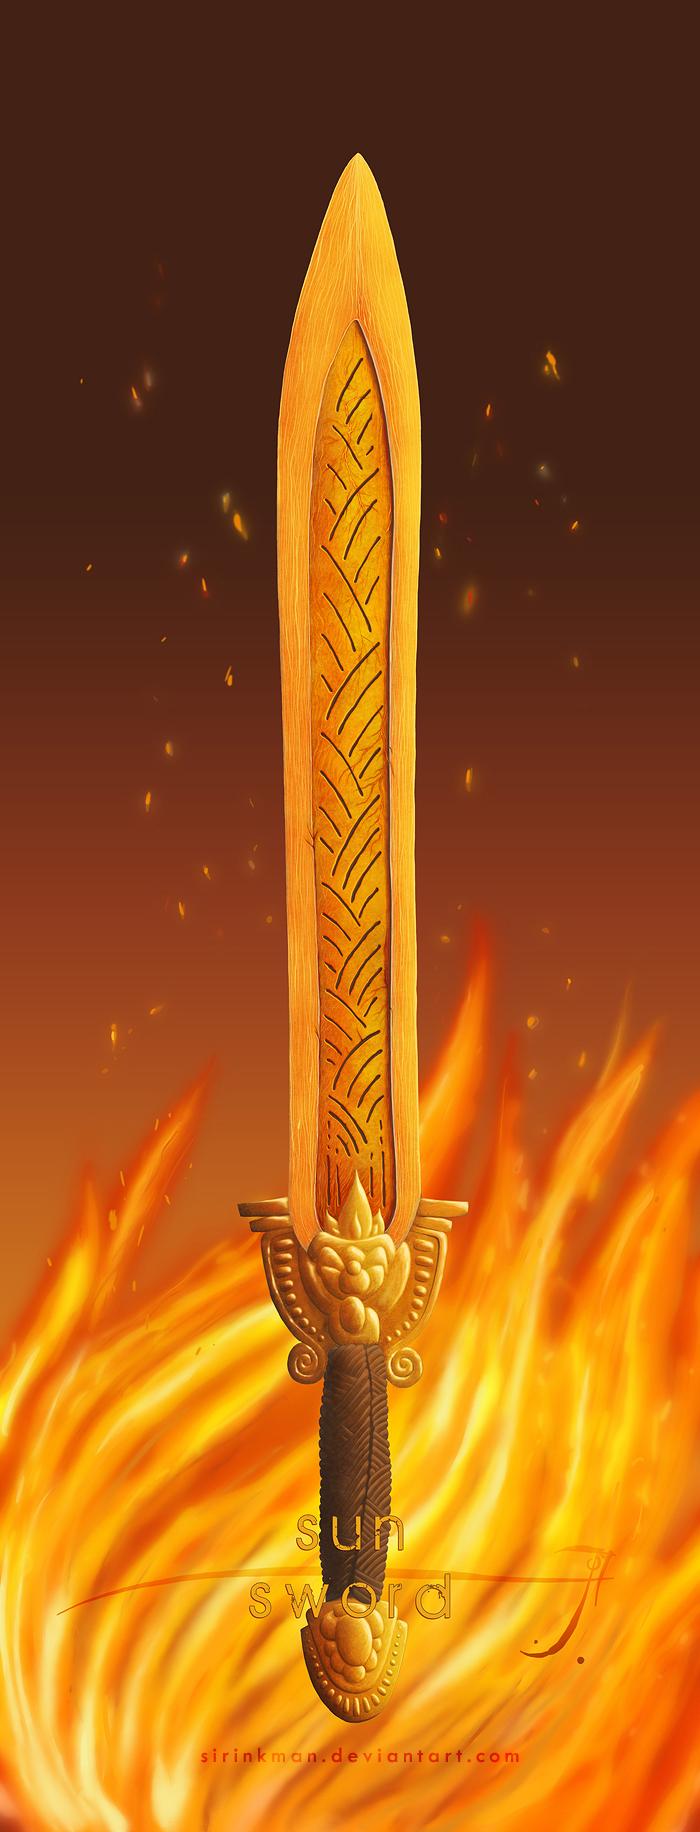 Sun sword [color] by SirInkman